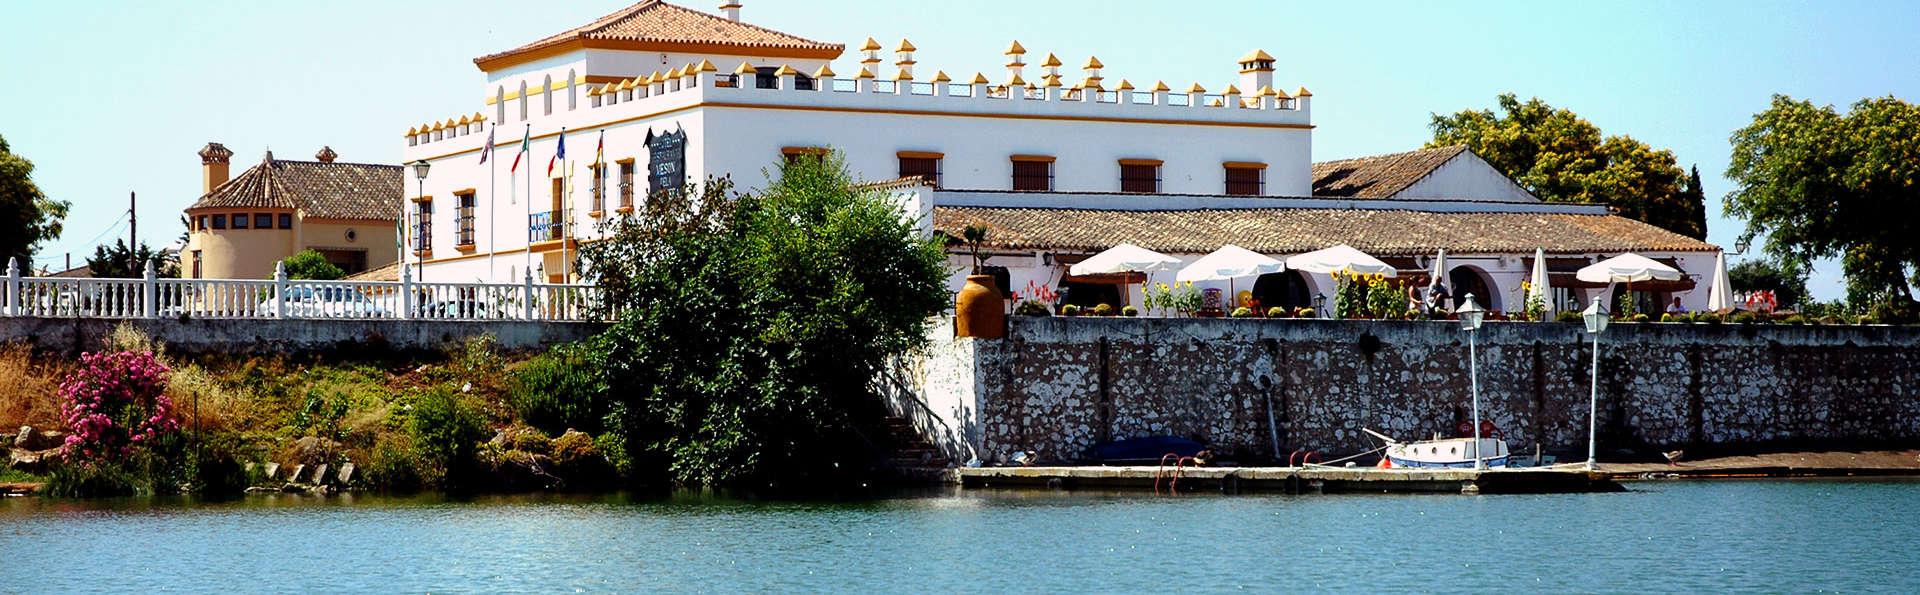 Hotel Mesón de la Molinera - edit_front.jpg